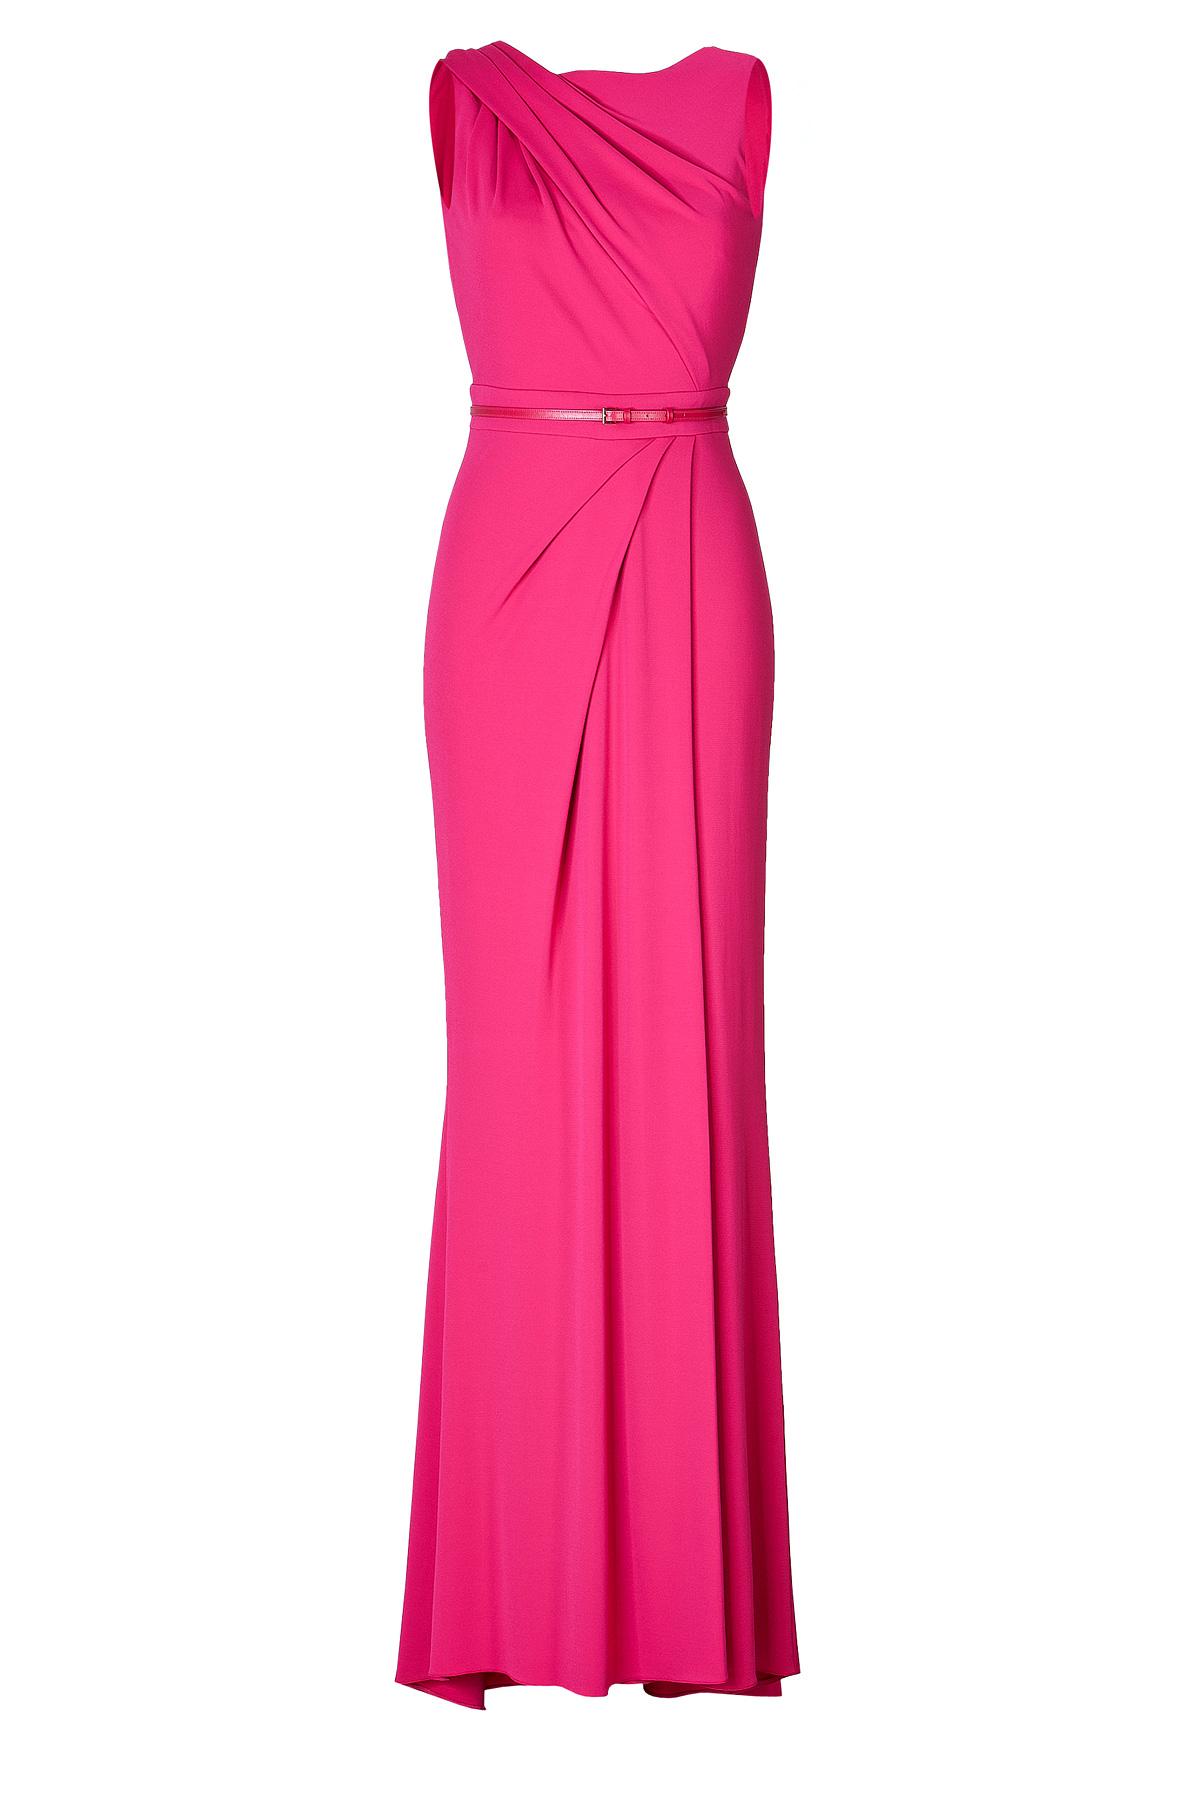 فستان وردي من إيلي صعب elie saab